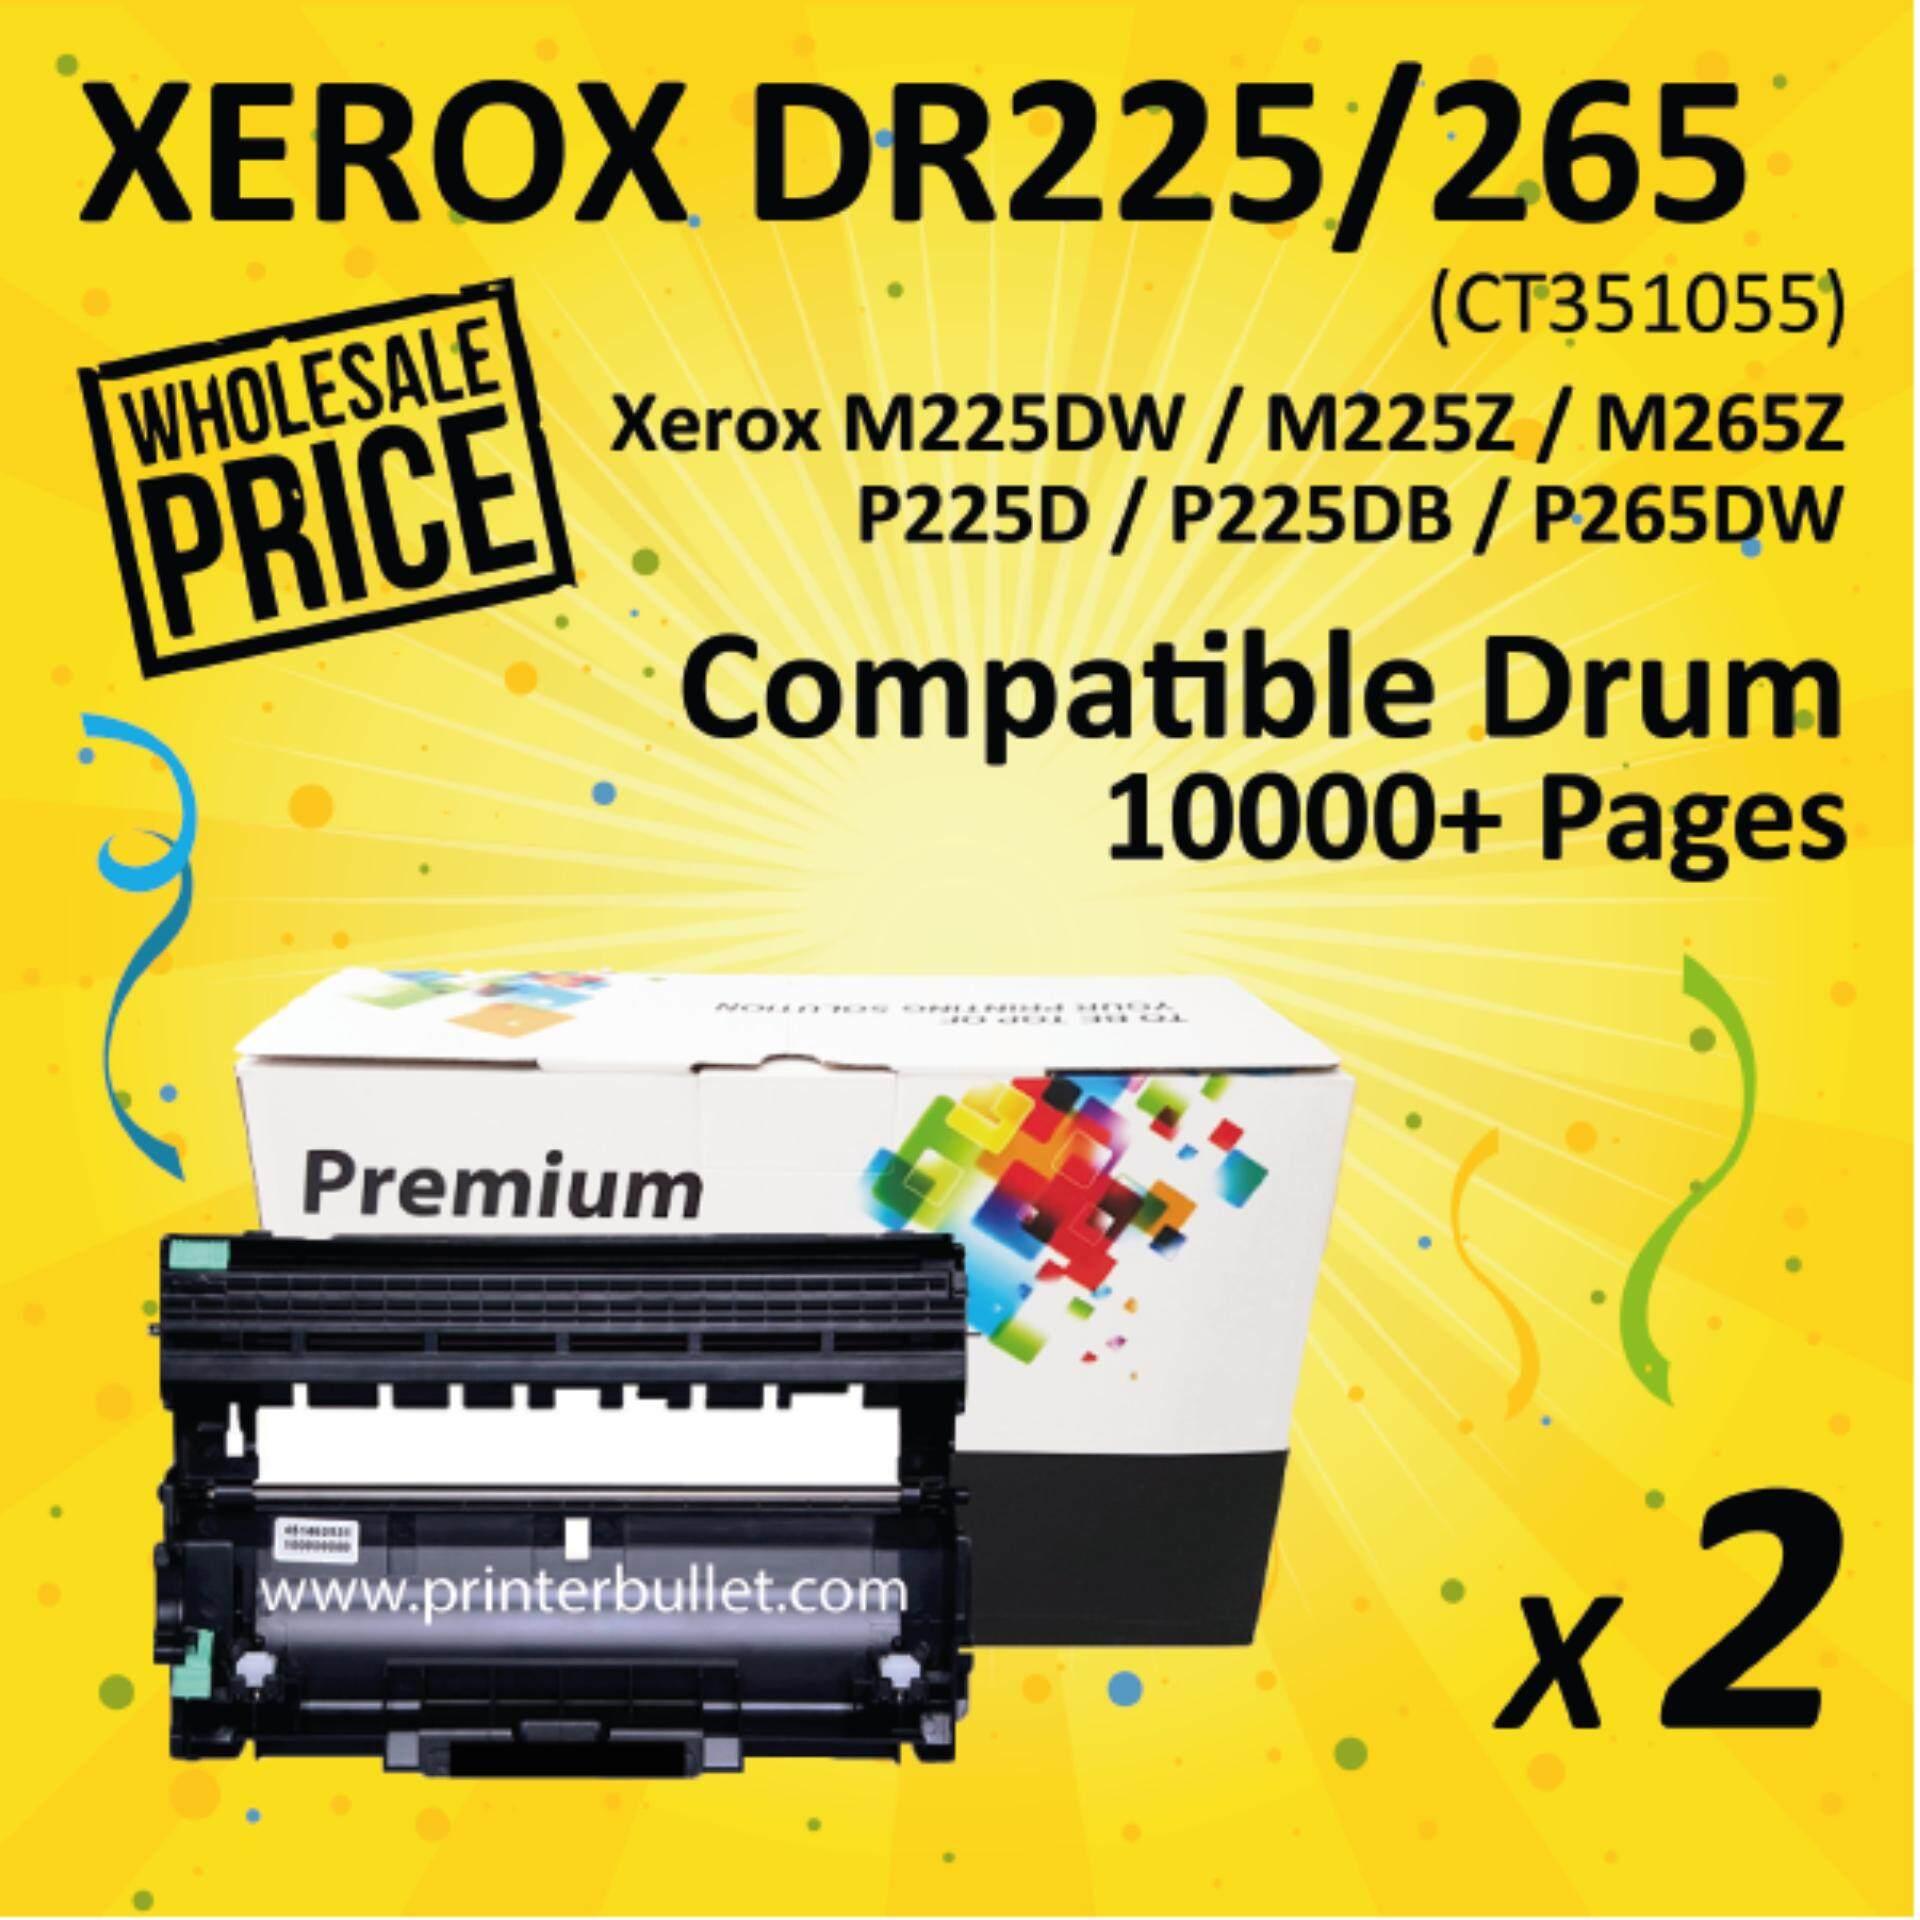 2 unit Fuji Xerox Compatible Drum Unit For Printer P225 / P225d / P225db /  P265dw / M225 / M225dw / M225z / M265z / CT351055 Compatible Imaging (Drum